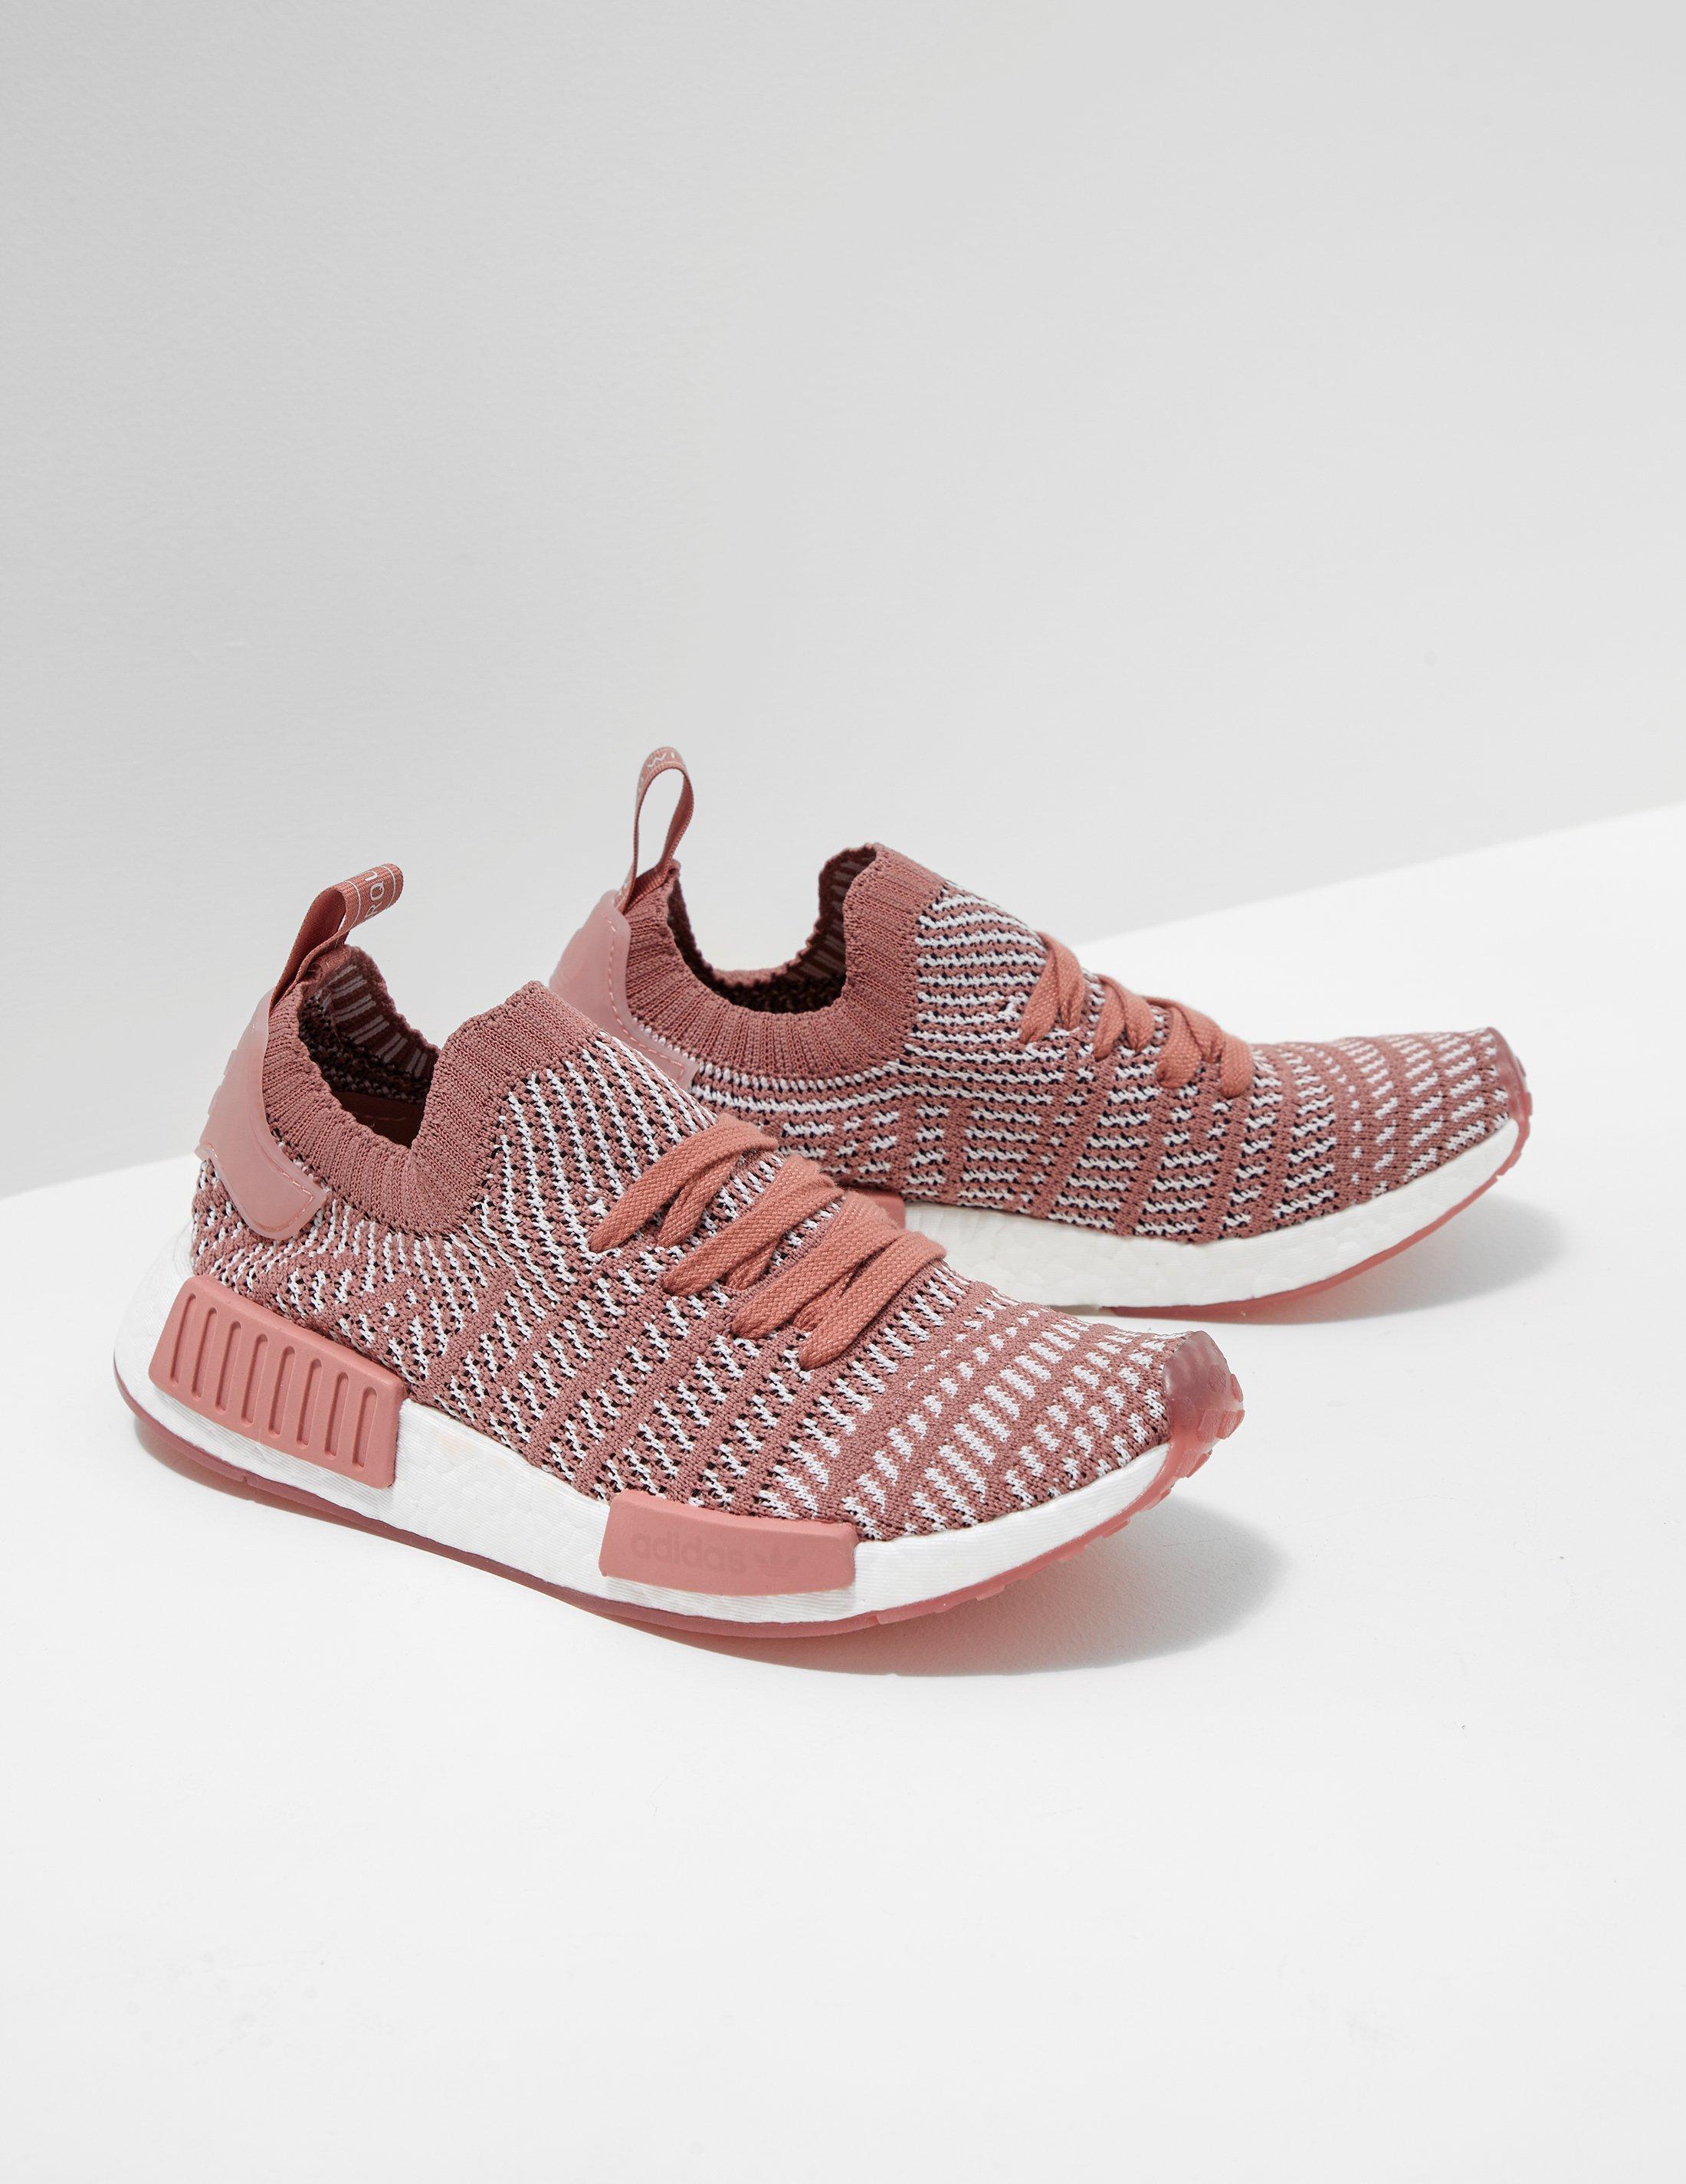 ce1695649aea8 adidas Originals Nmd r1 Stlt Pk Running Shoe in Pink - Lyst